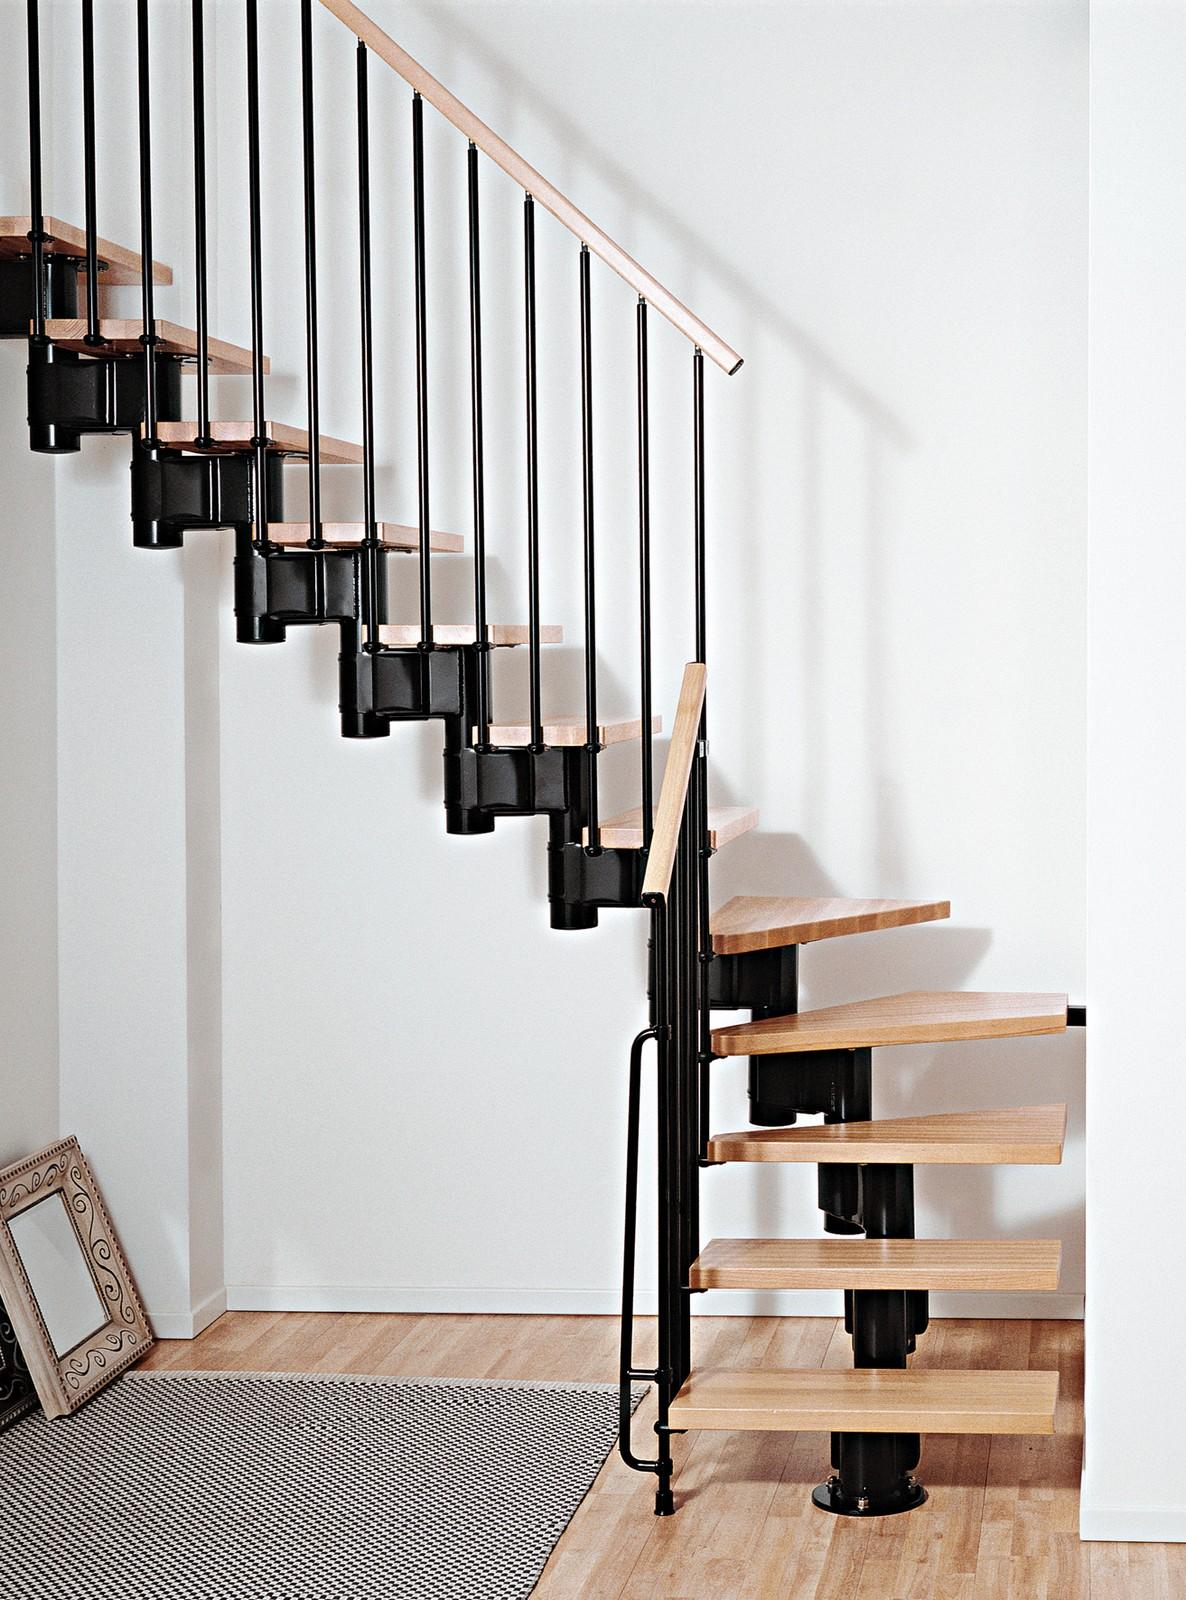 Kompact Adjustable Staircase Kit   Metal, Steel And Wood Spiral Staircase    Fontanot